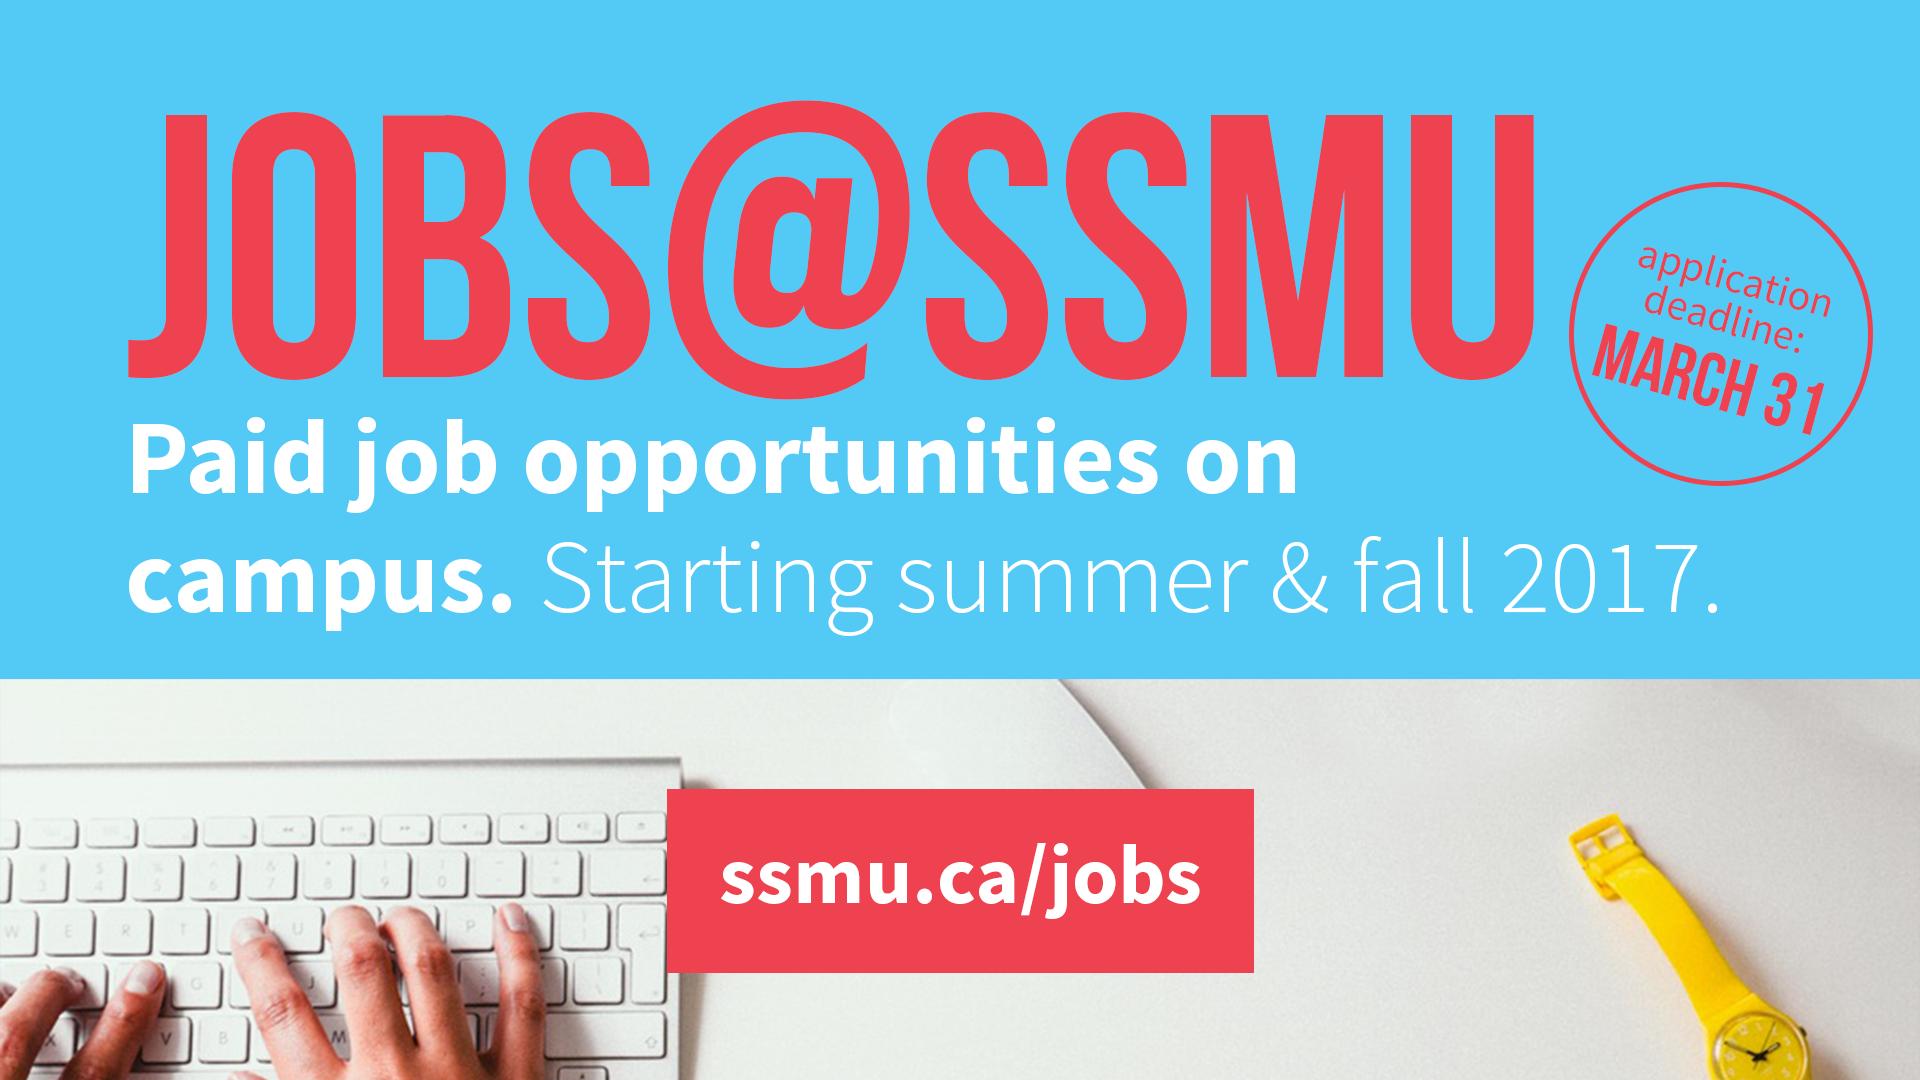 ssmu_jobs_office